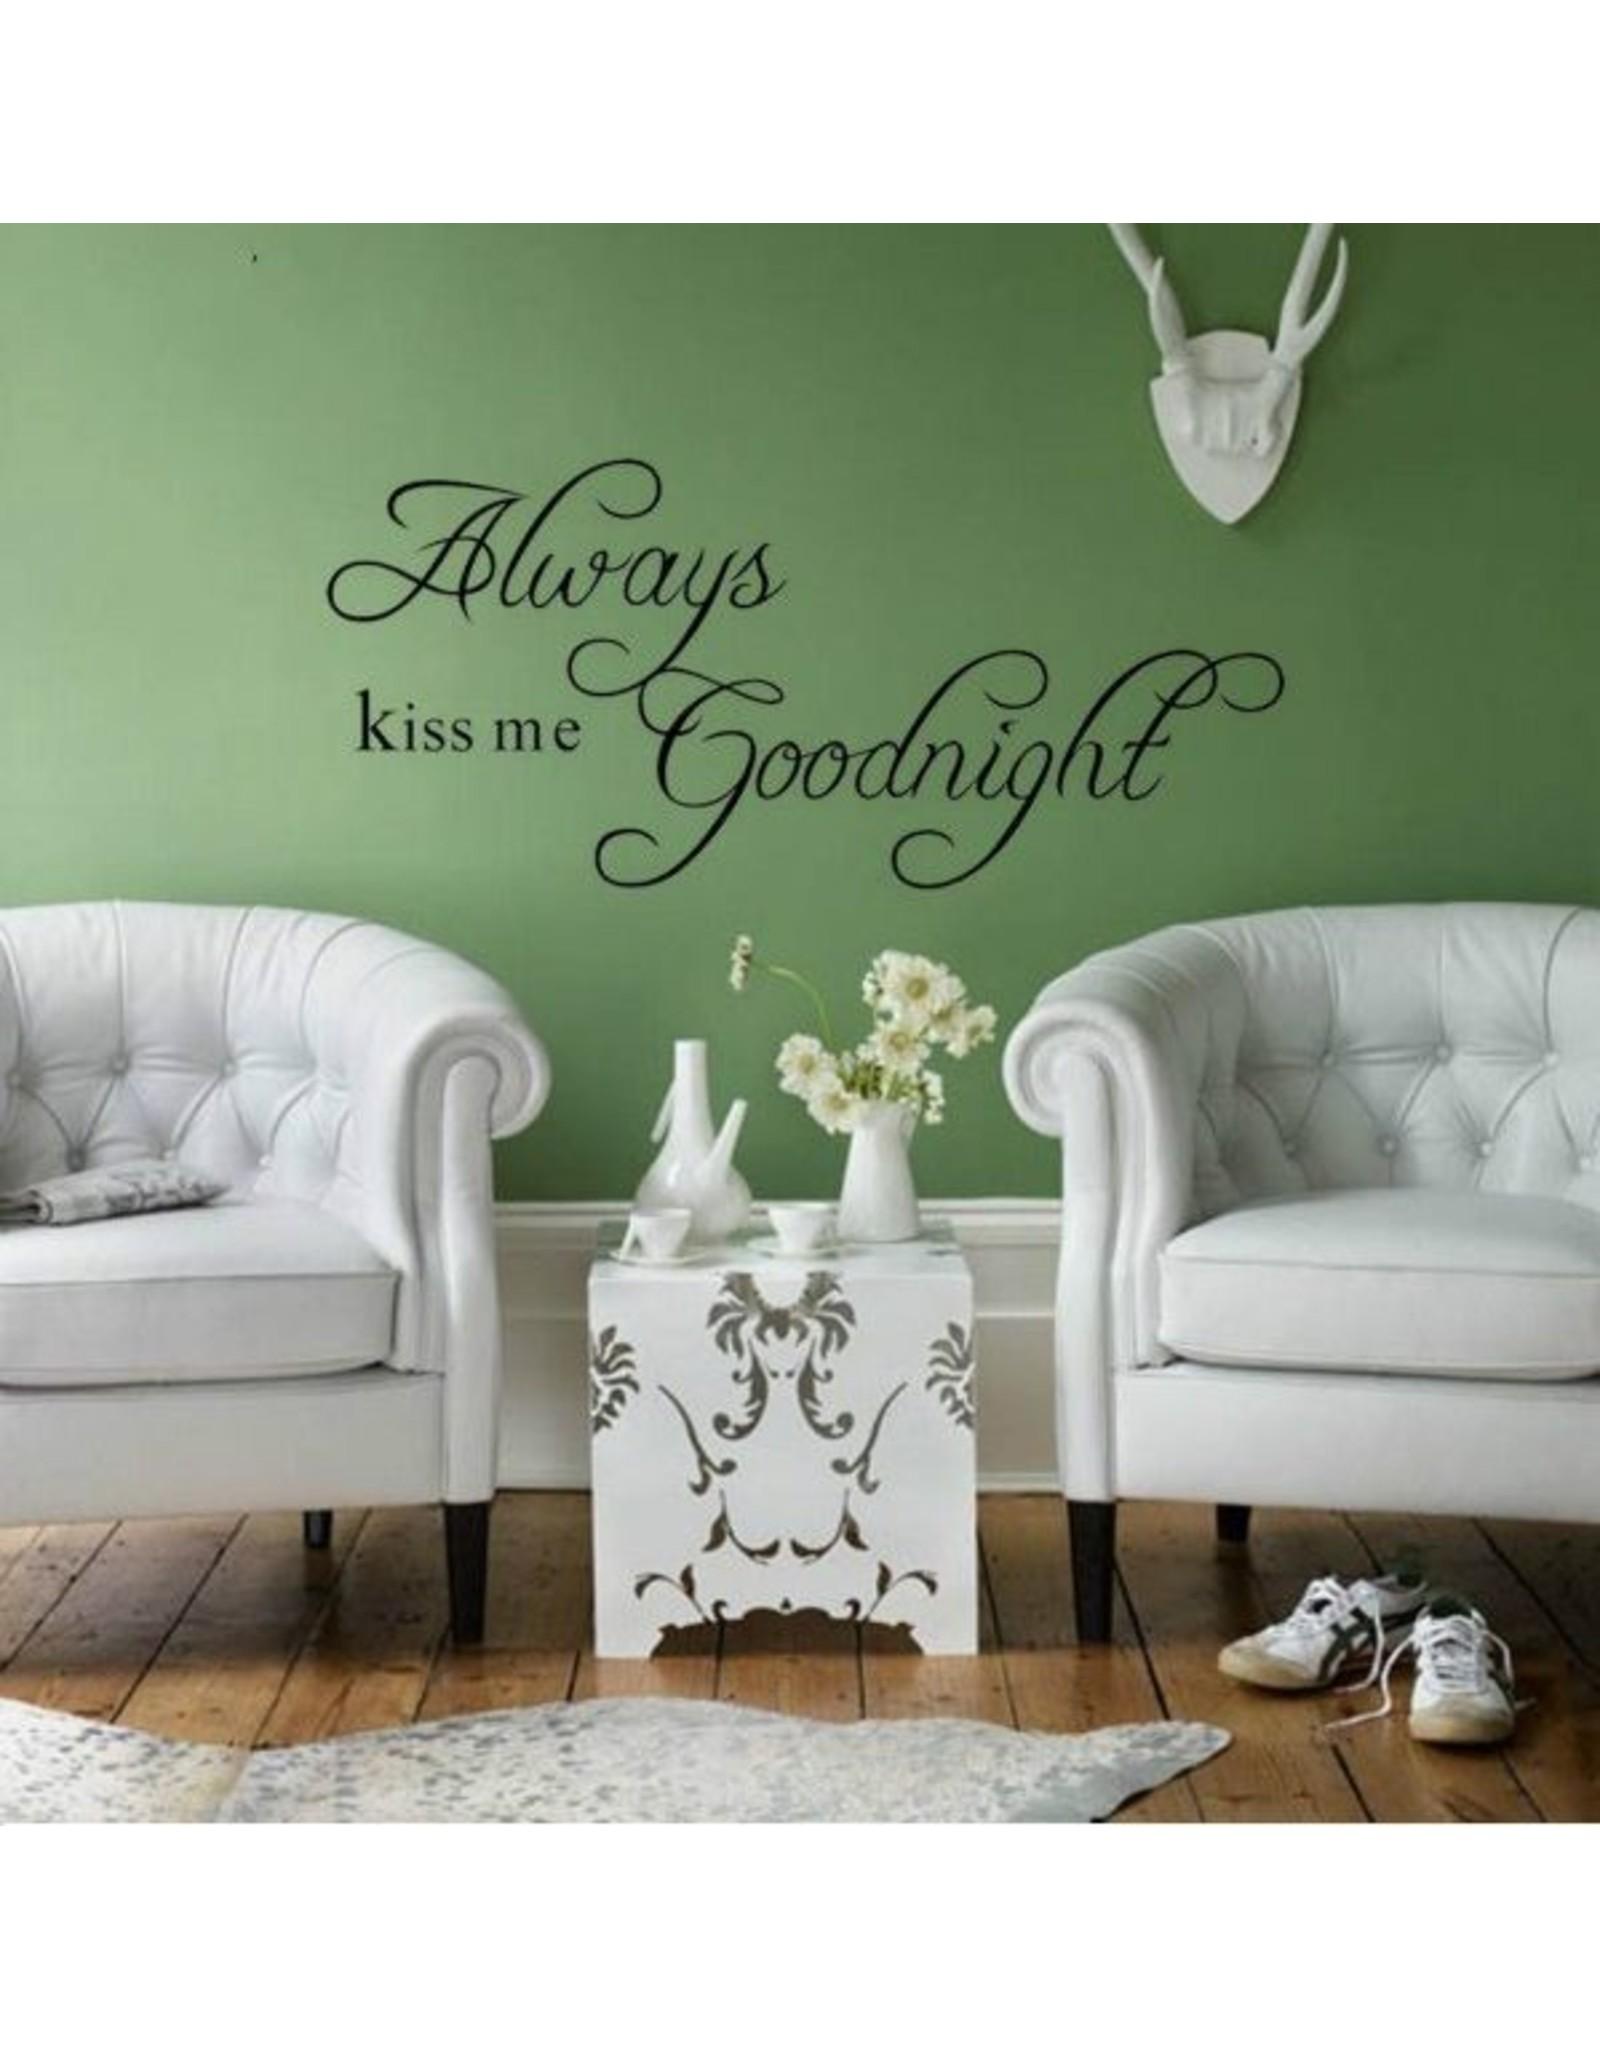 Muursticker 'Kiss me Goodnight' - Body & Soap